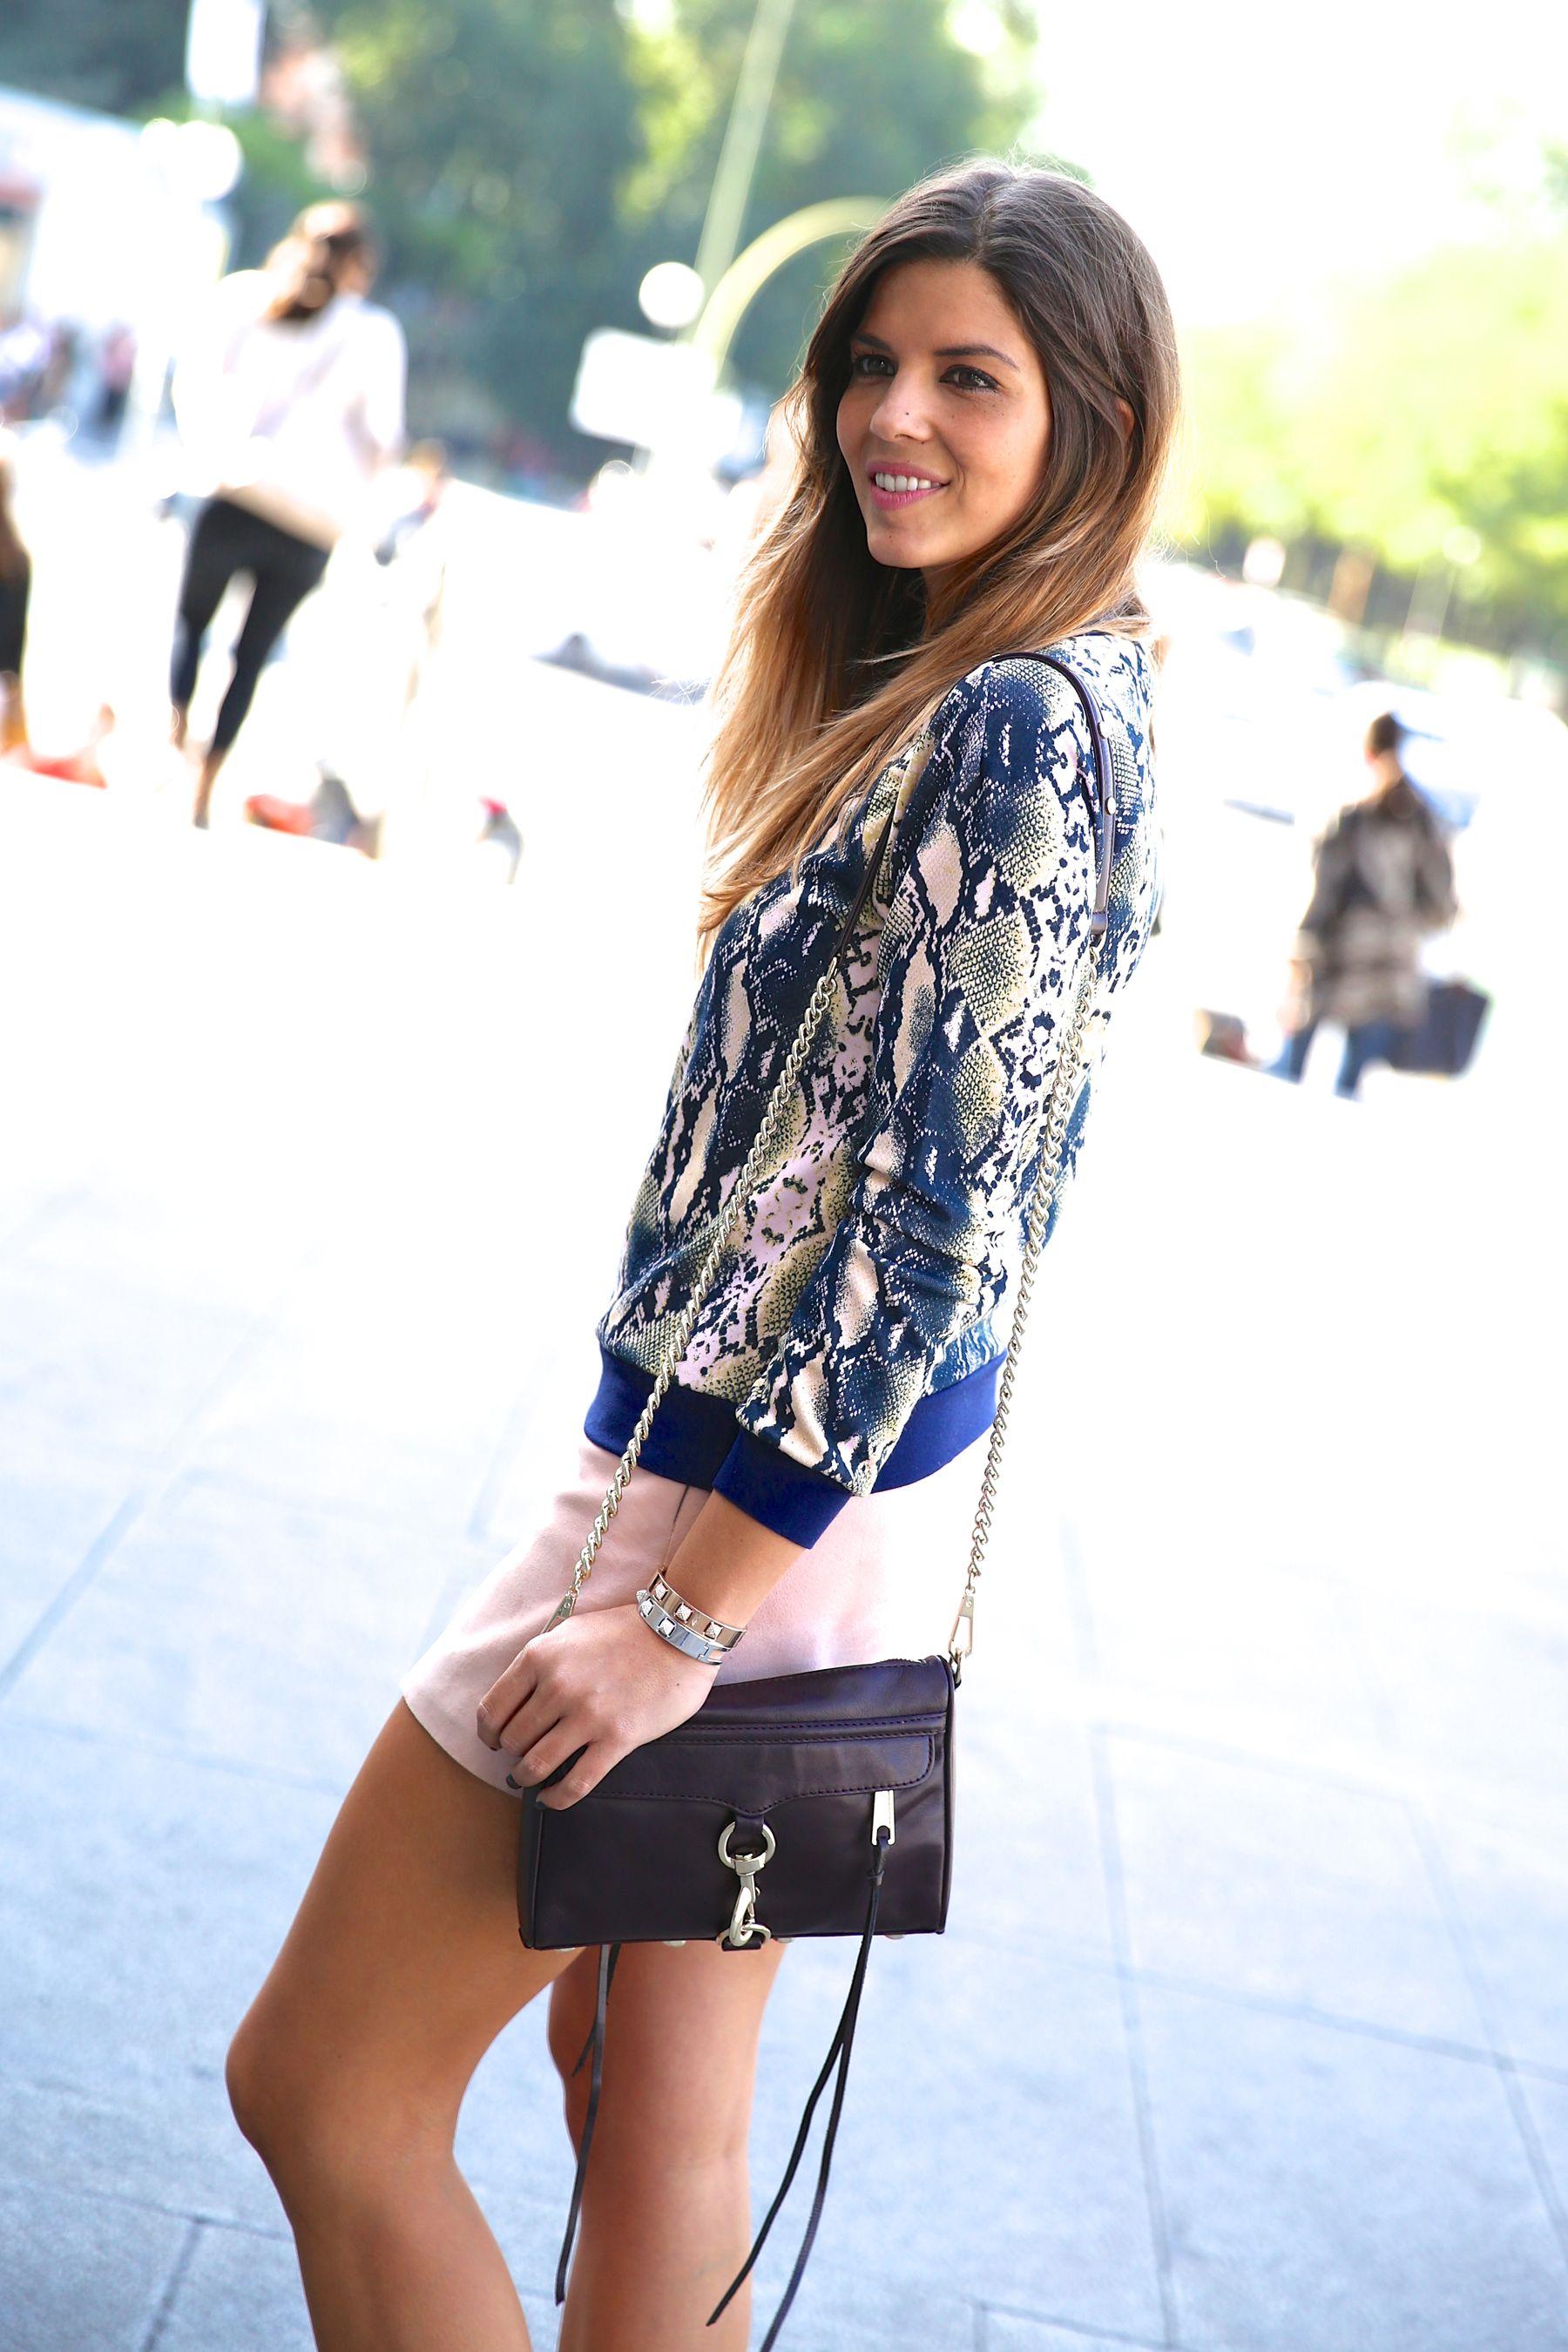 trendy_taste-look-outfit-street_style-ootd-blog-blogger-fashion_spain-moda_españa-girissima.com-sweatshirt-sudadera-estampado-crocodile-cocodrilo-botines-booties-pink_skirt-falda_rosa-5